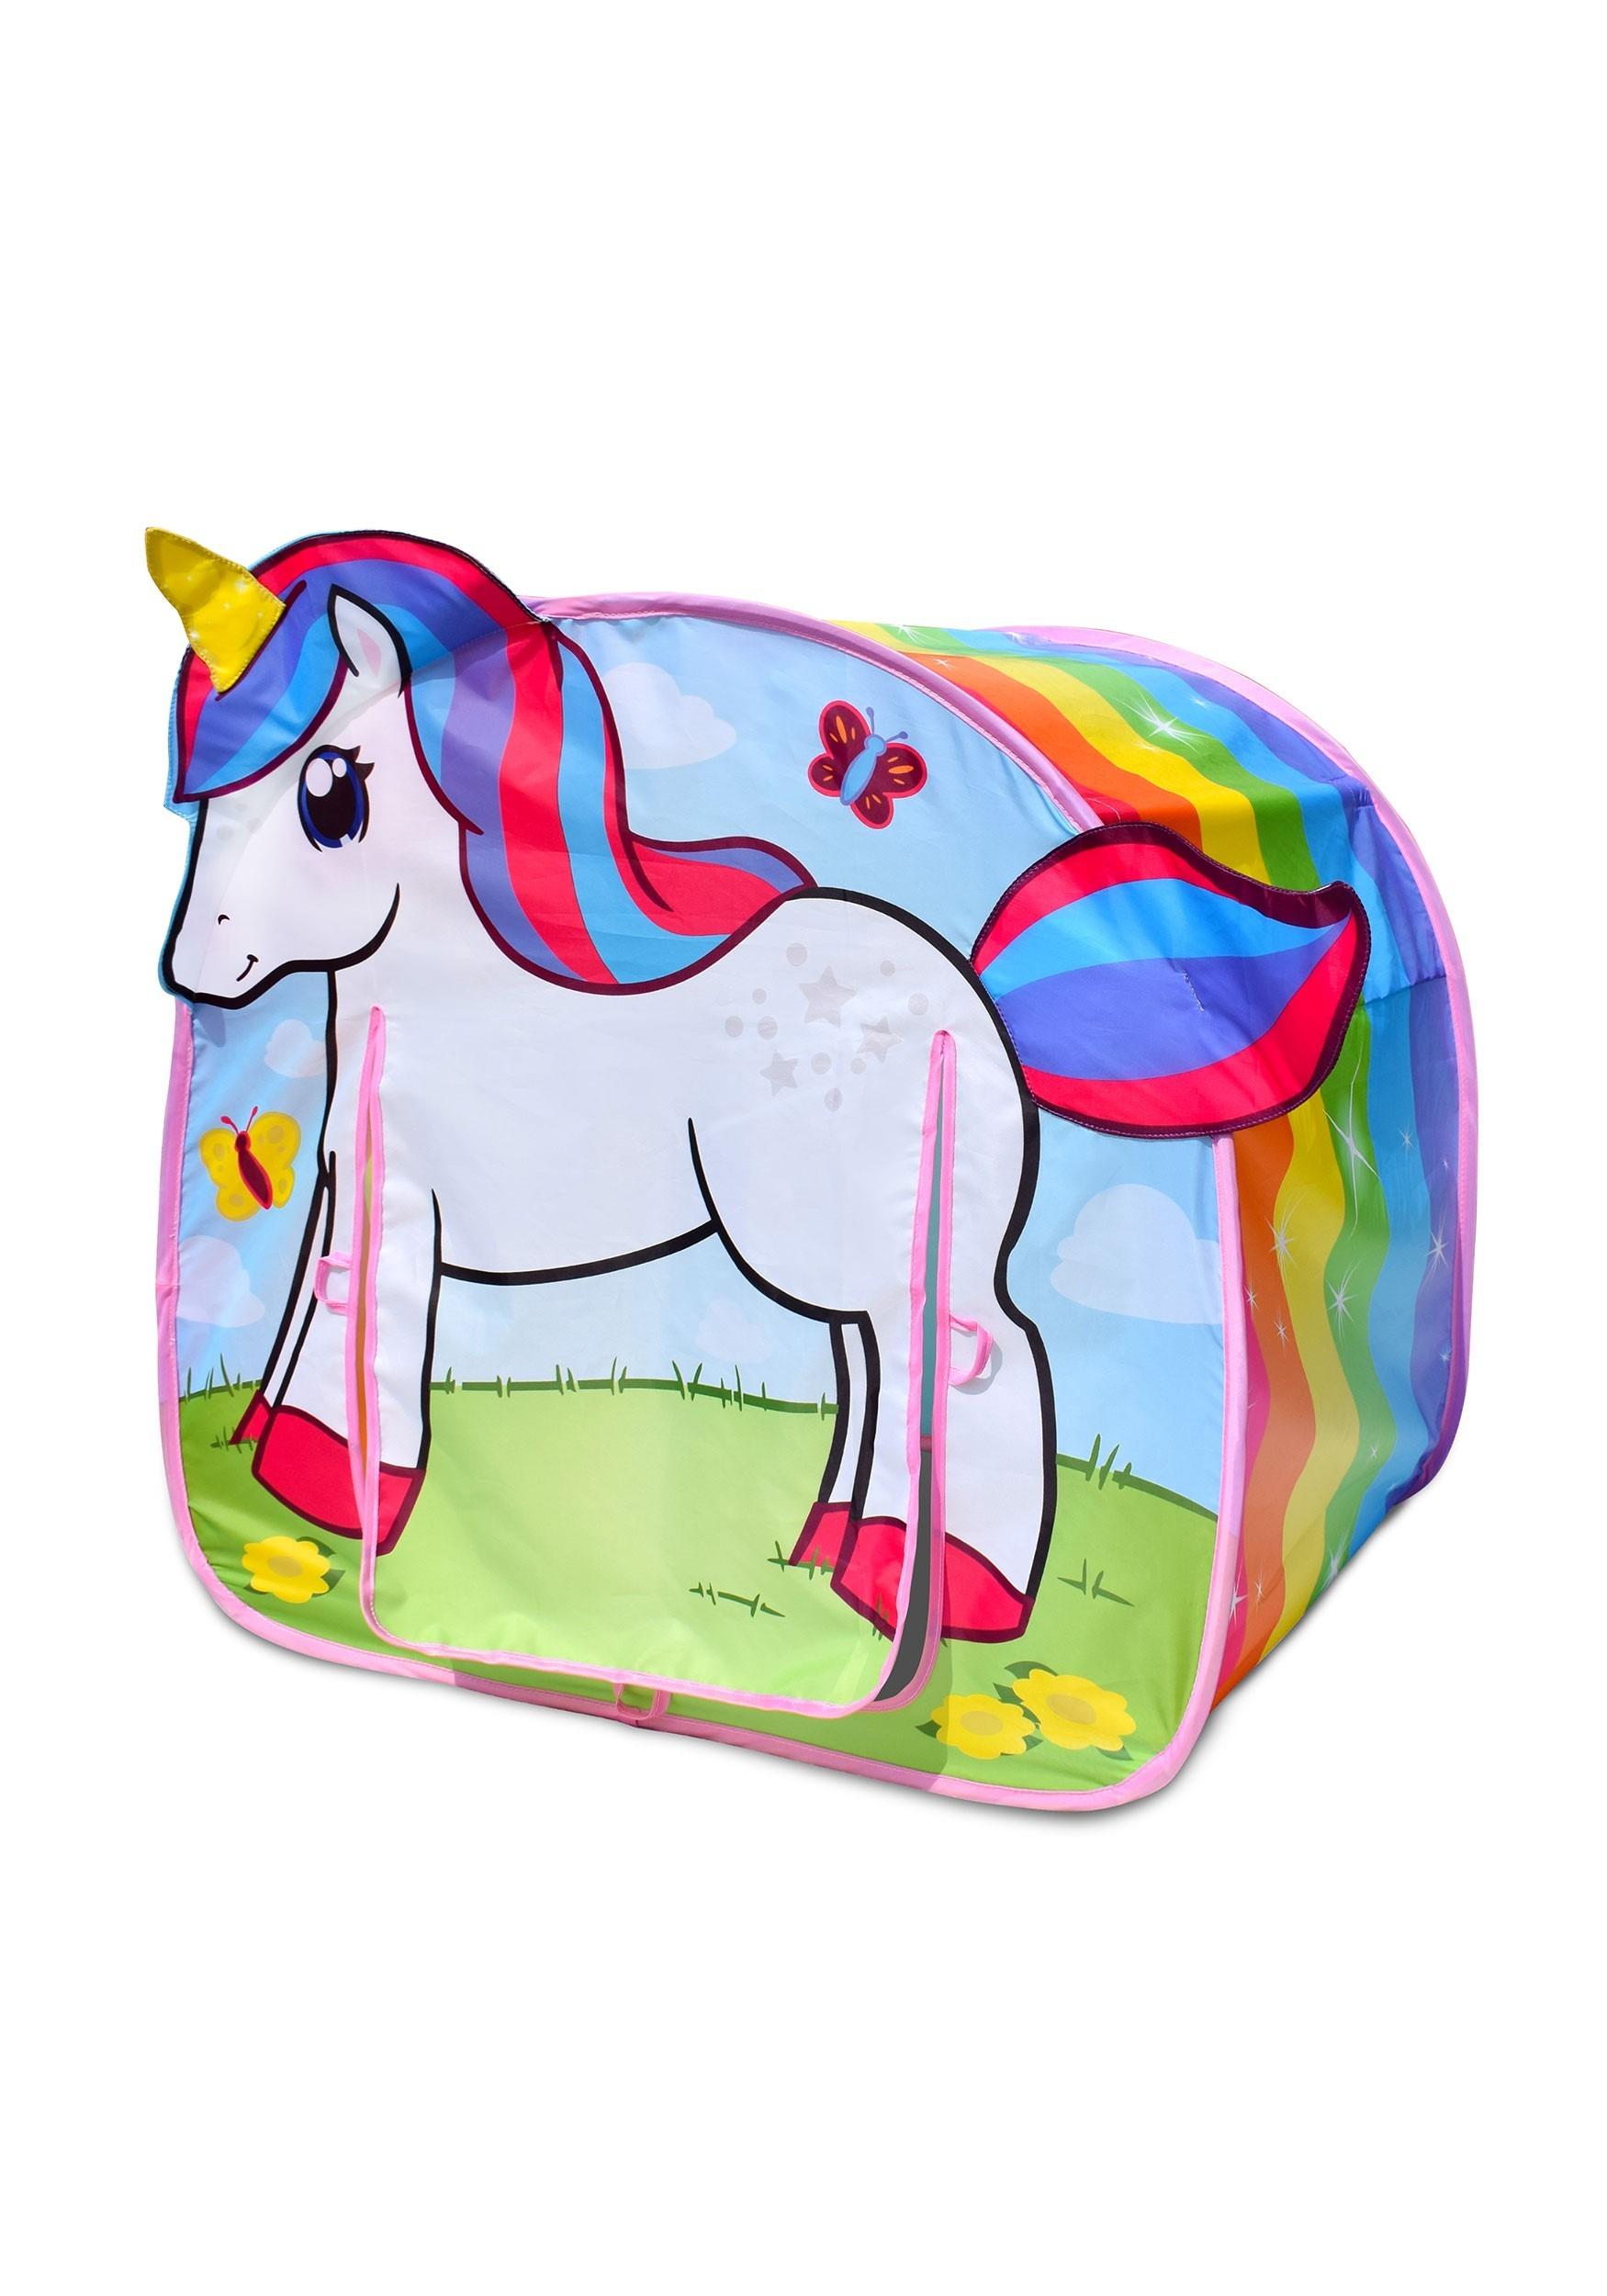 Pop-Up Unicorn Rainbow Dream Play Tent